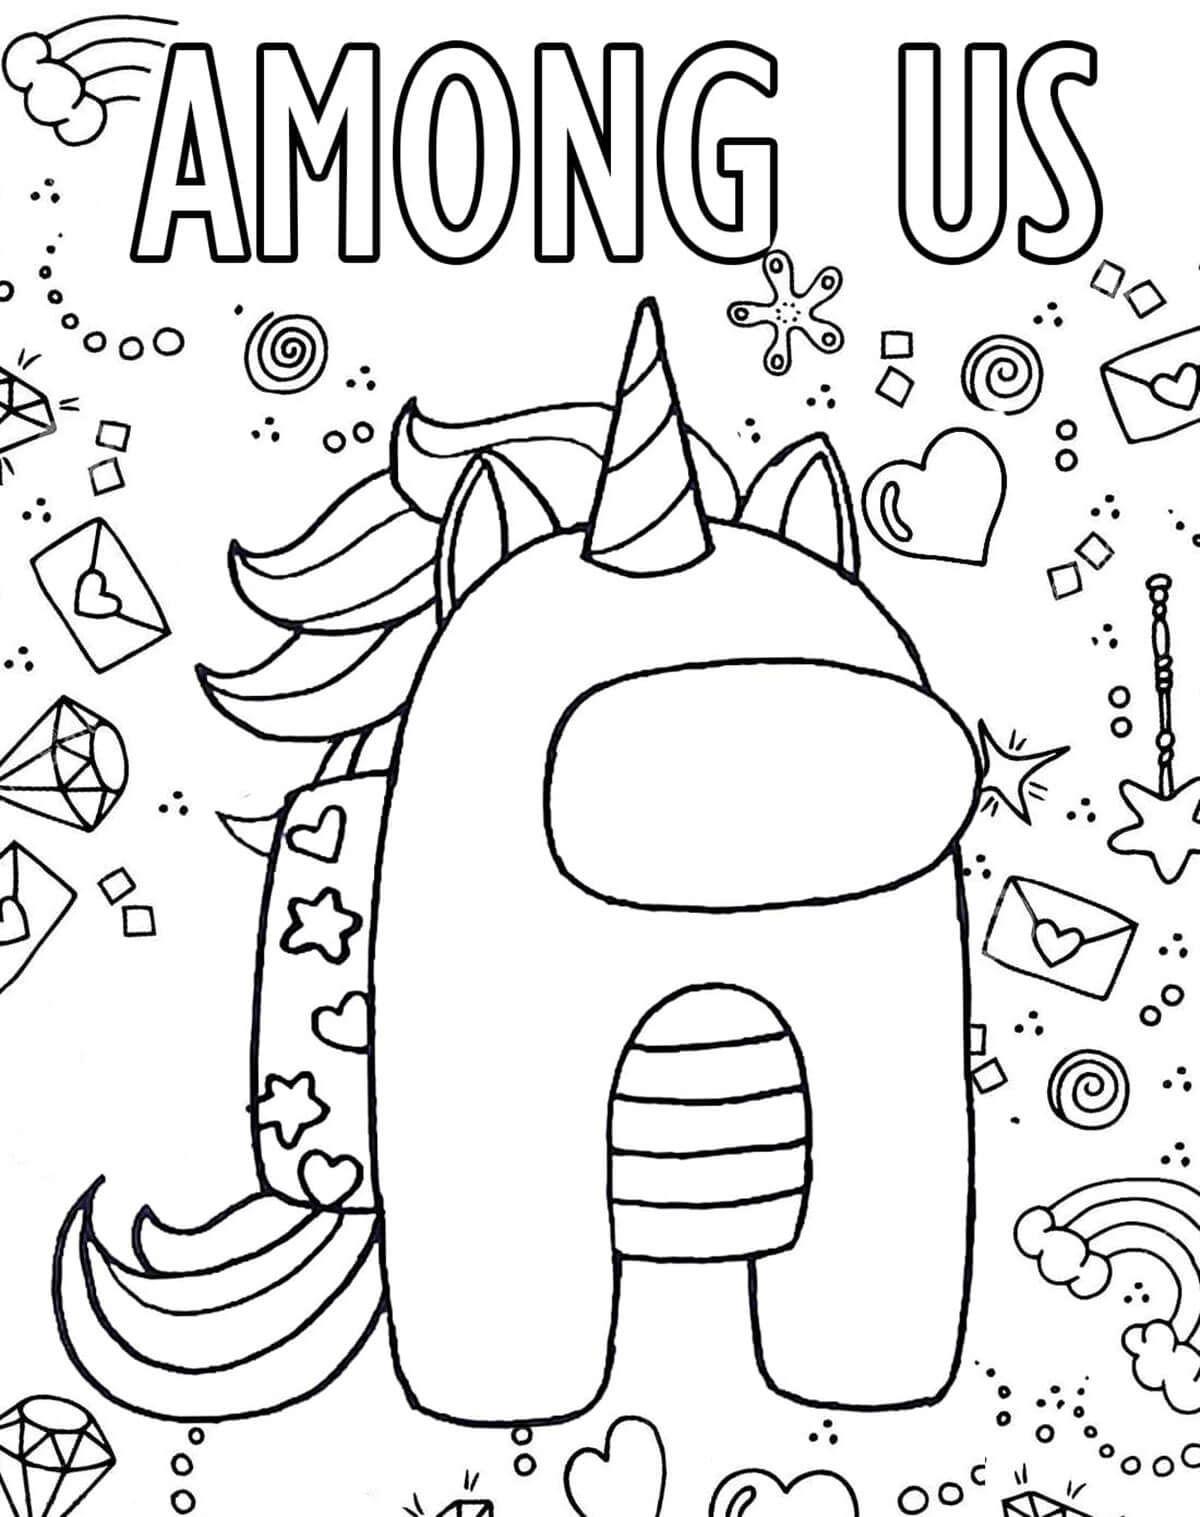 Simple Among Us Coloring Page Free Printable Coloring Pages For Kids Unicorn Coloring Pages Free Kids Coloring Pages Printable Coloring Pages